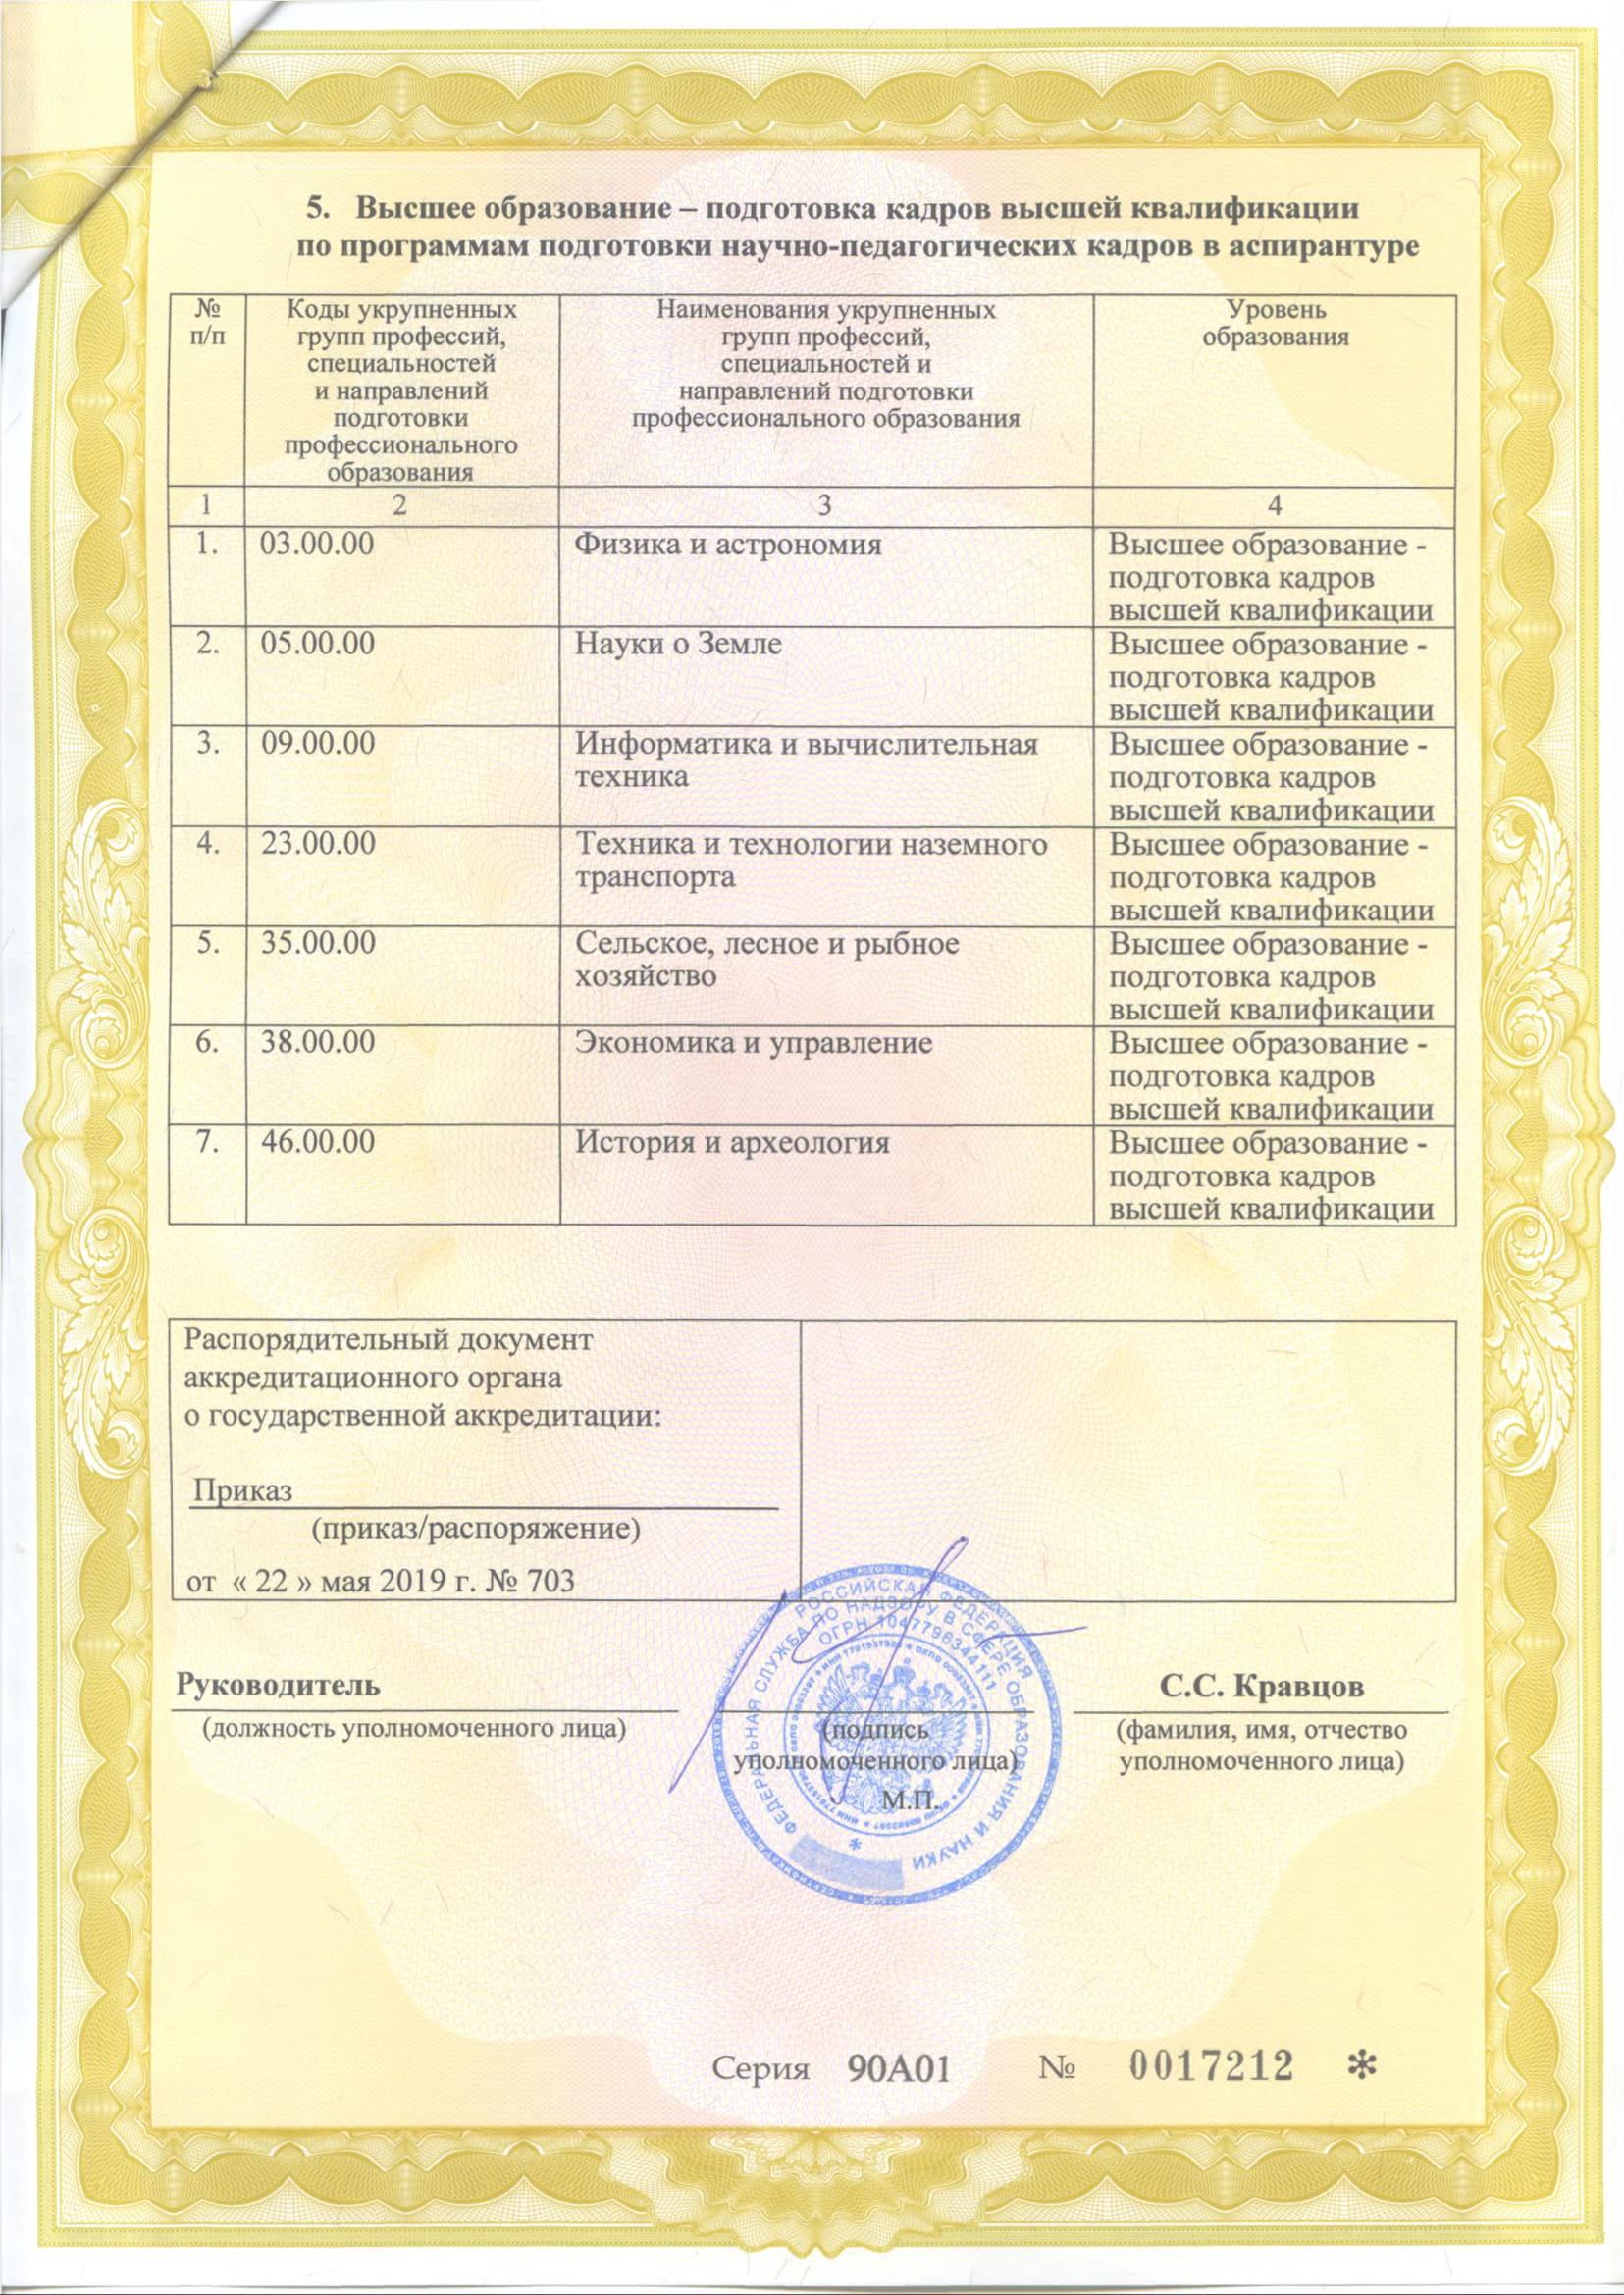 http://departamentvpo.ru/wp-content/uploads/2019/06/prilozhenie-k-akkreditacii_22.05.19-3.jpg